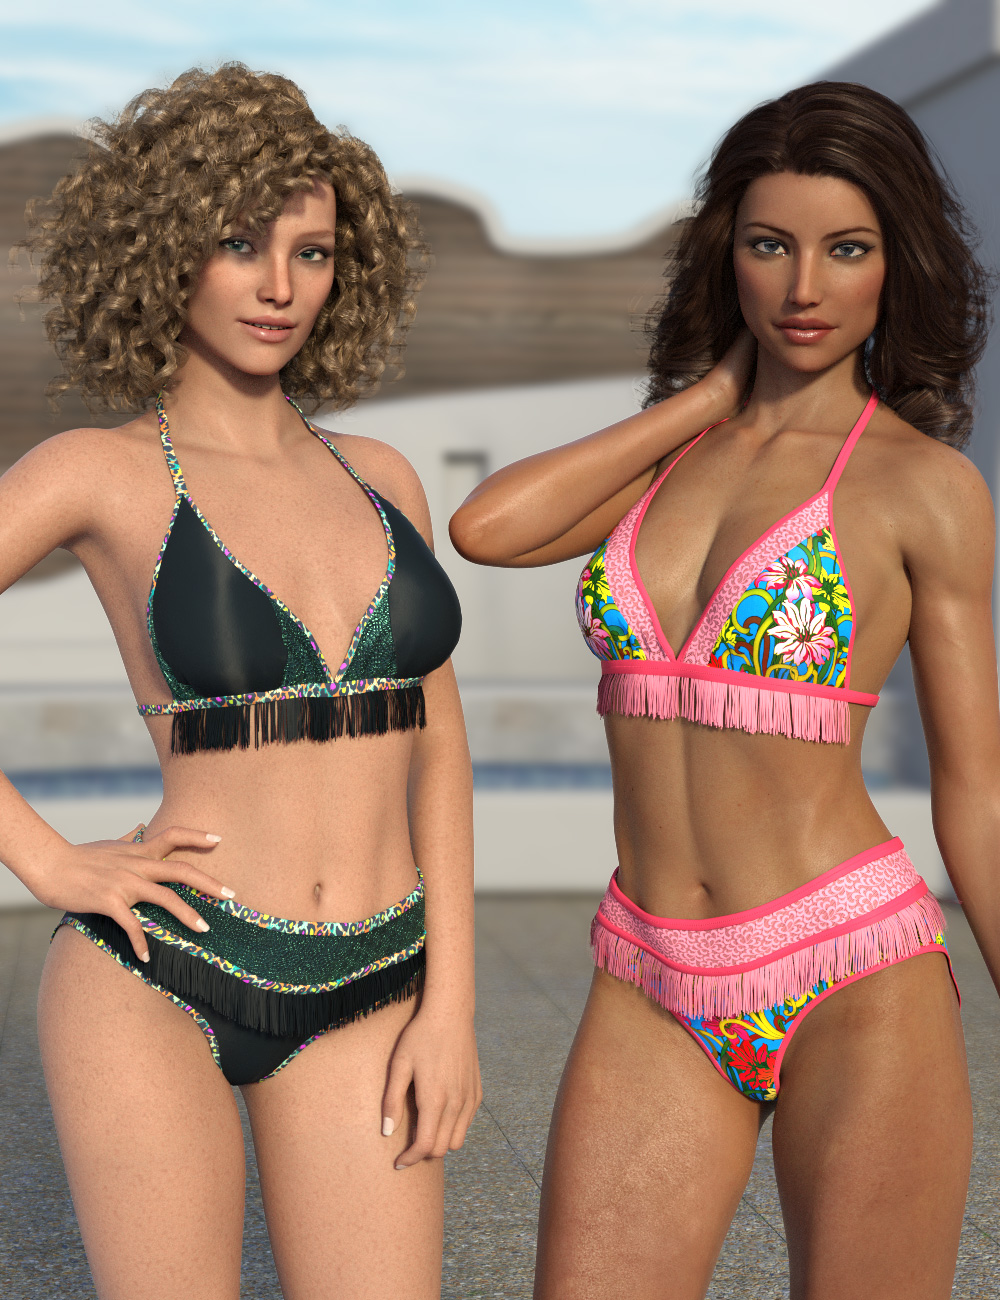 Fringe Bikini Texture Expansion by: esha, 3D Models by Daz 3D